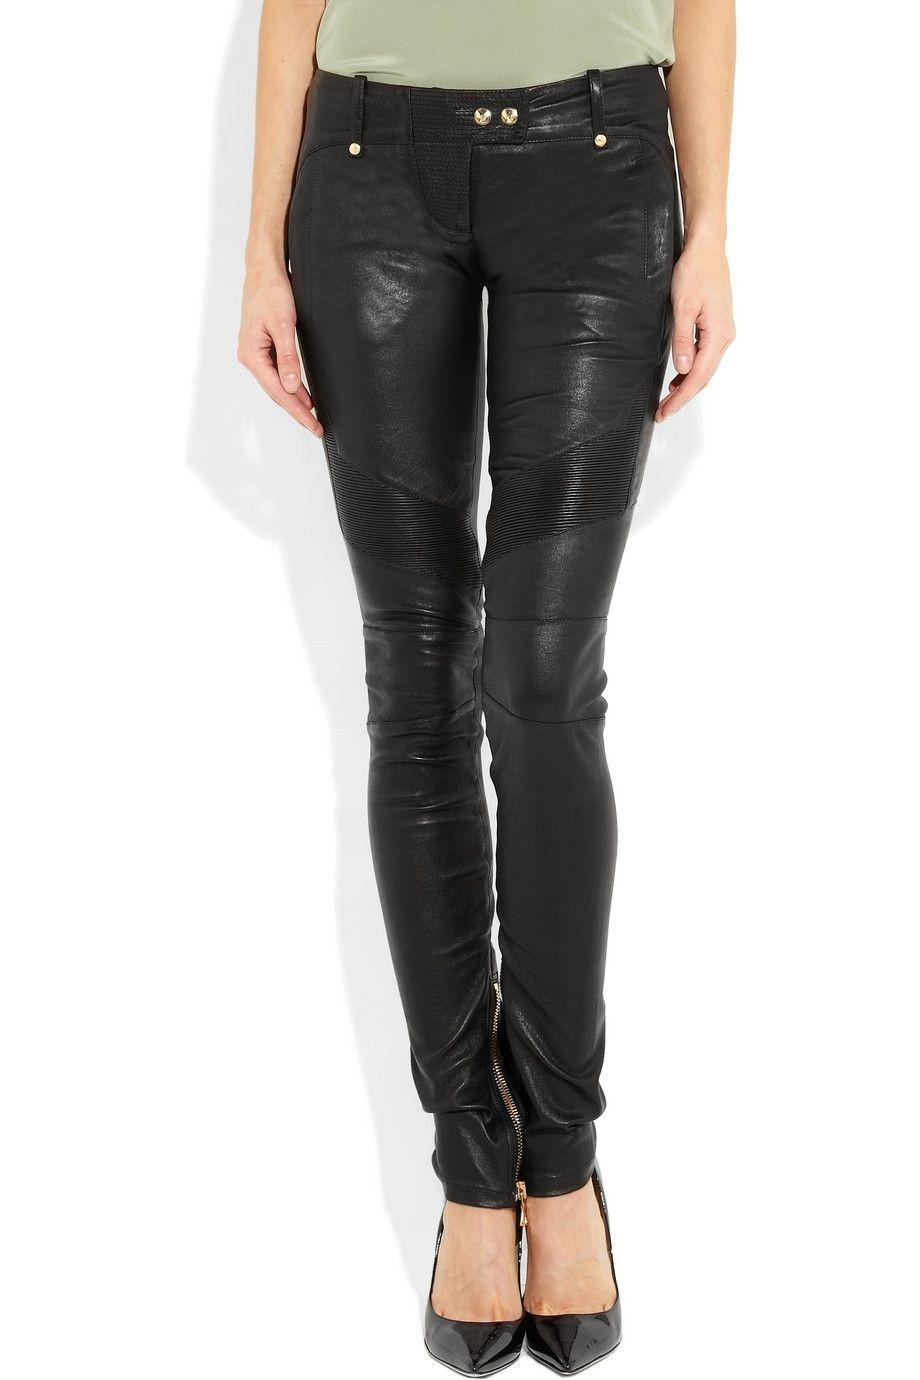 55ddafc0890 Balmain   Skinny leather pants   NET-A-PORTER.COM   Daddy Like ...